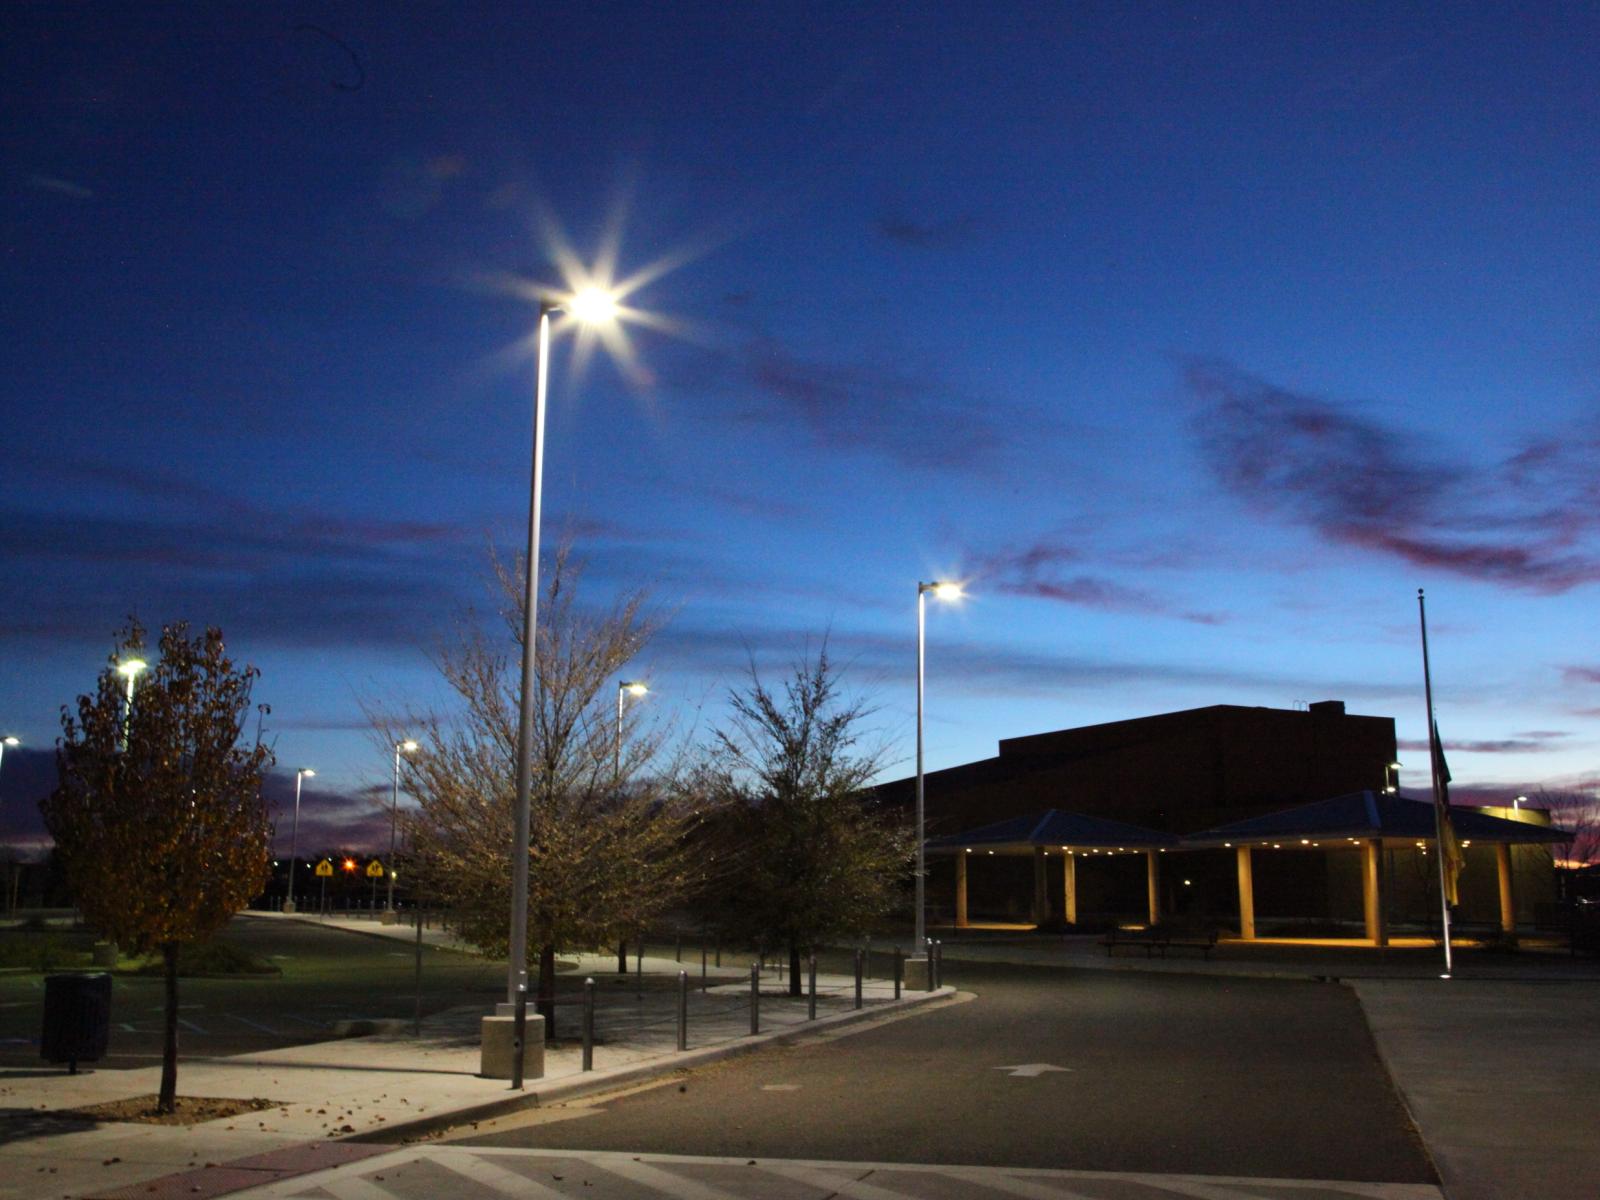 Durable Outdoor Fixtures Create Safe Public Spaces